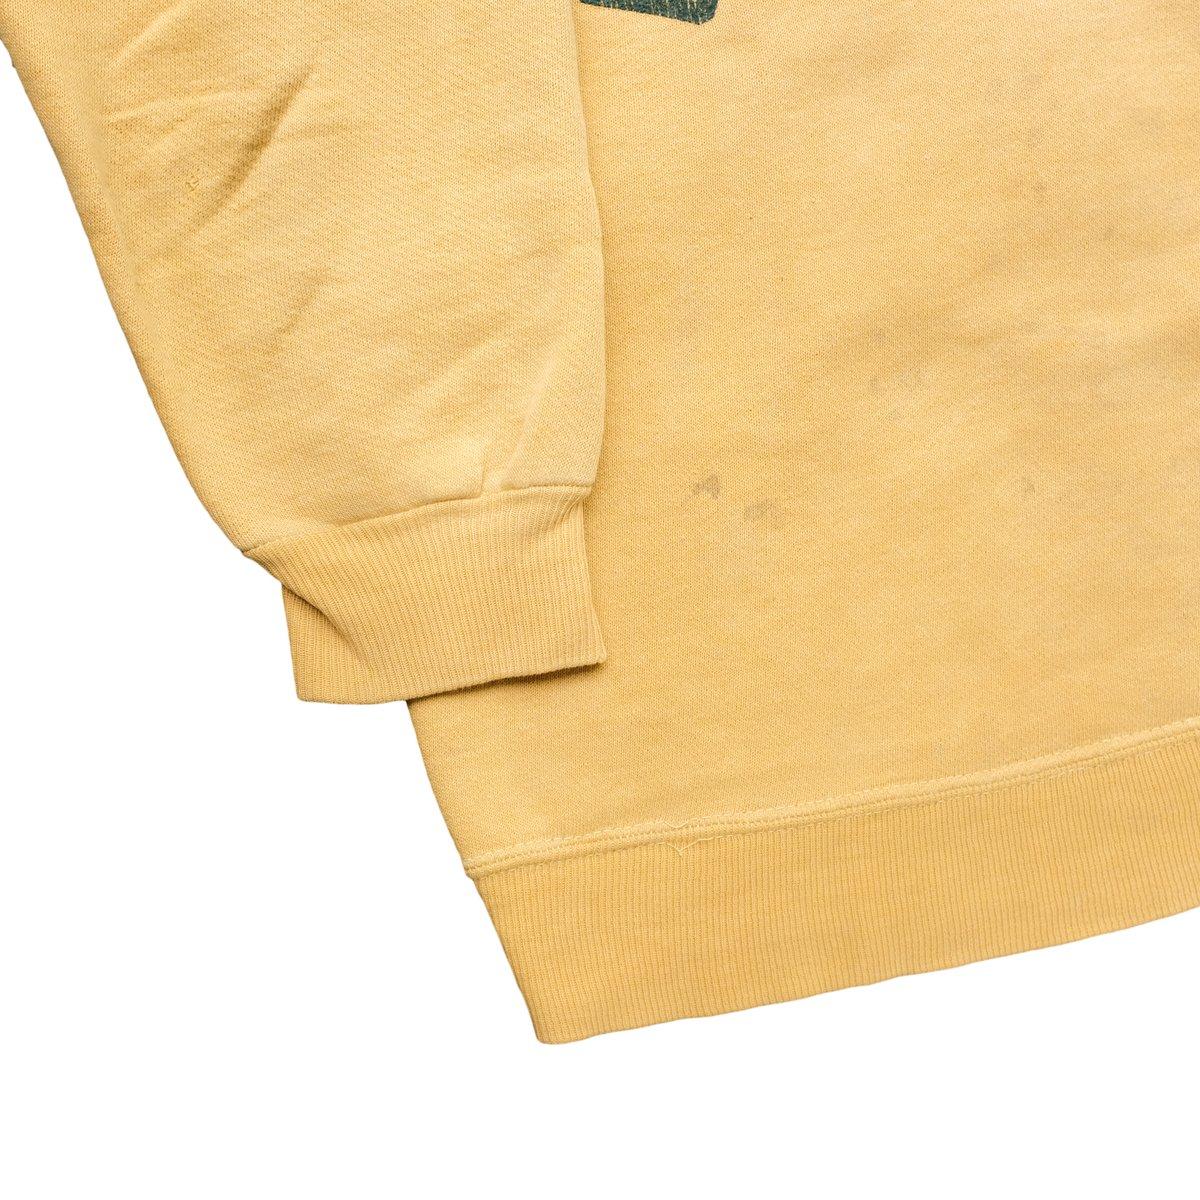 Image of Vintage 1960's Sunfaded Yellow Camp Tapawingo Sweatshirt